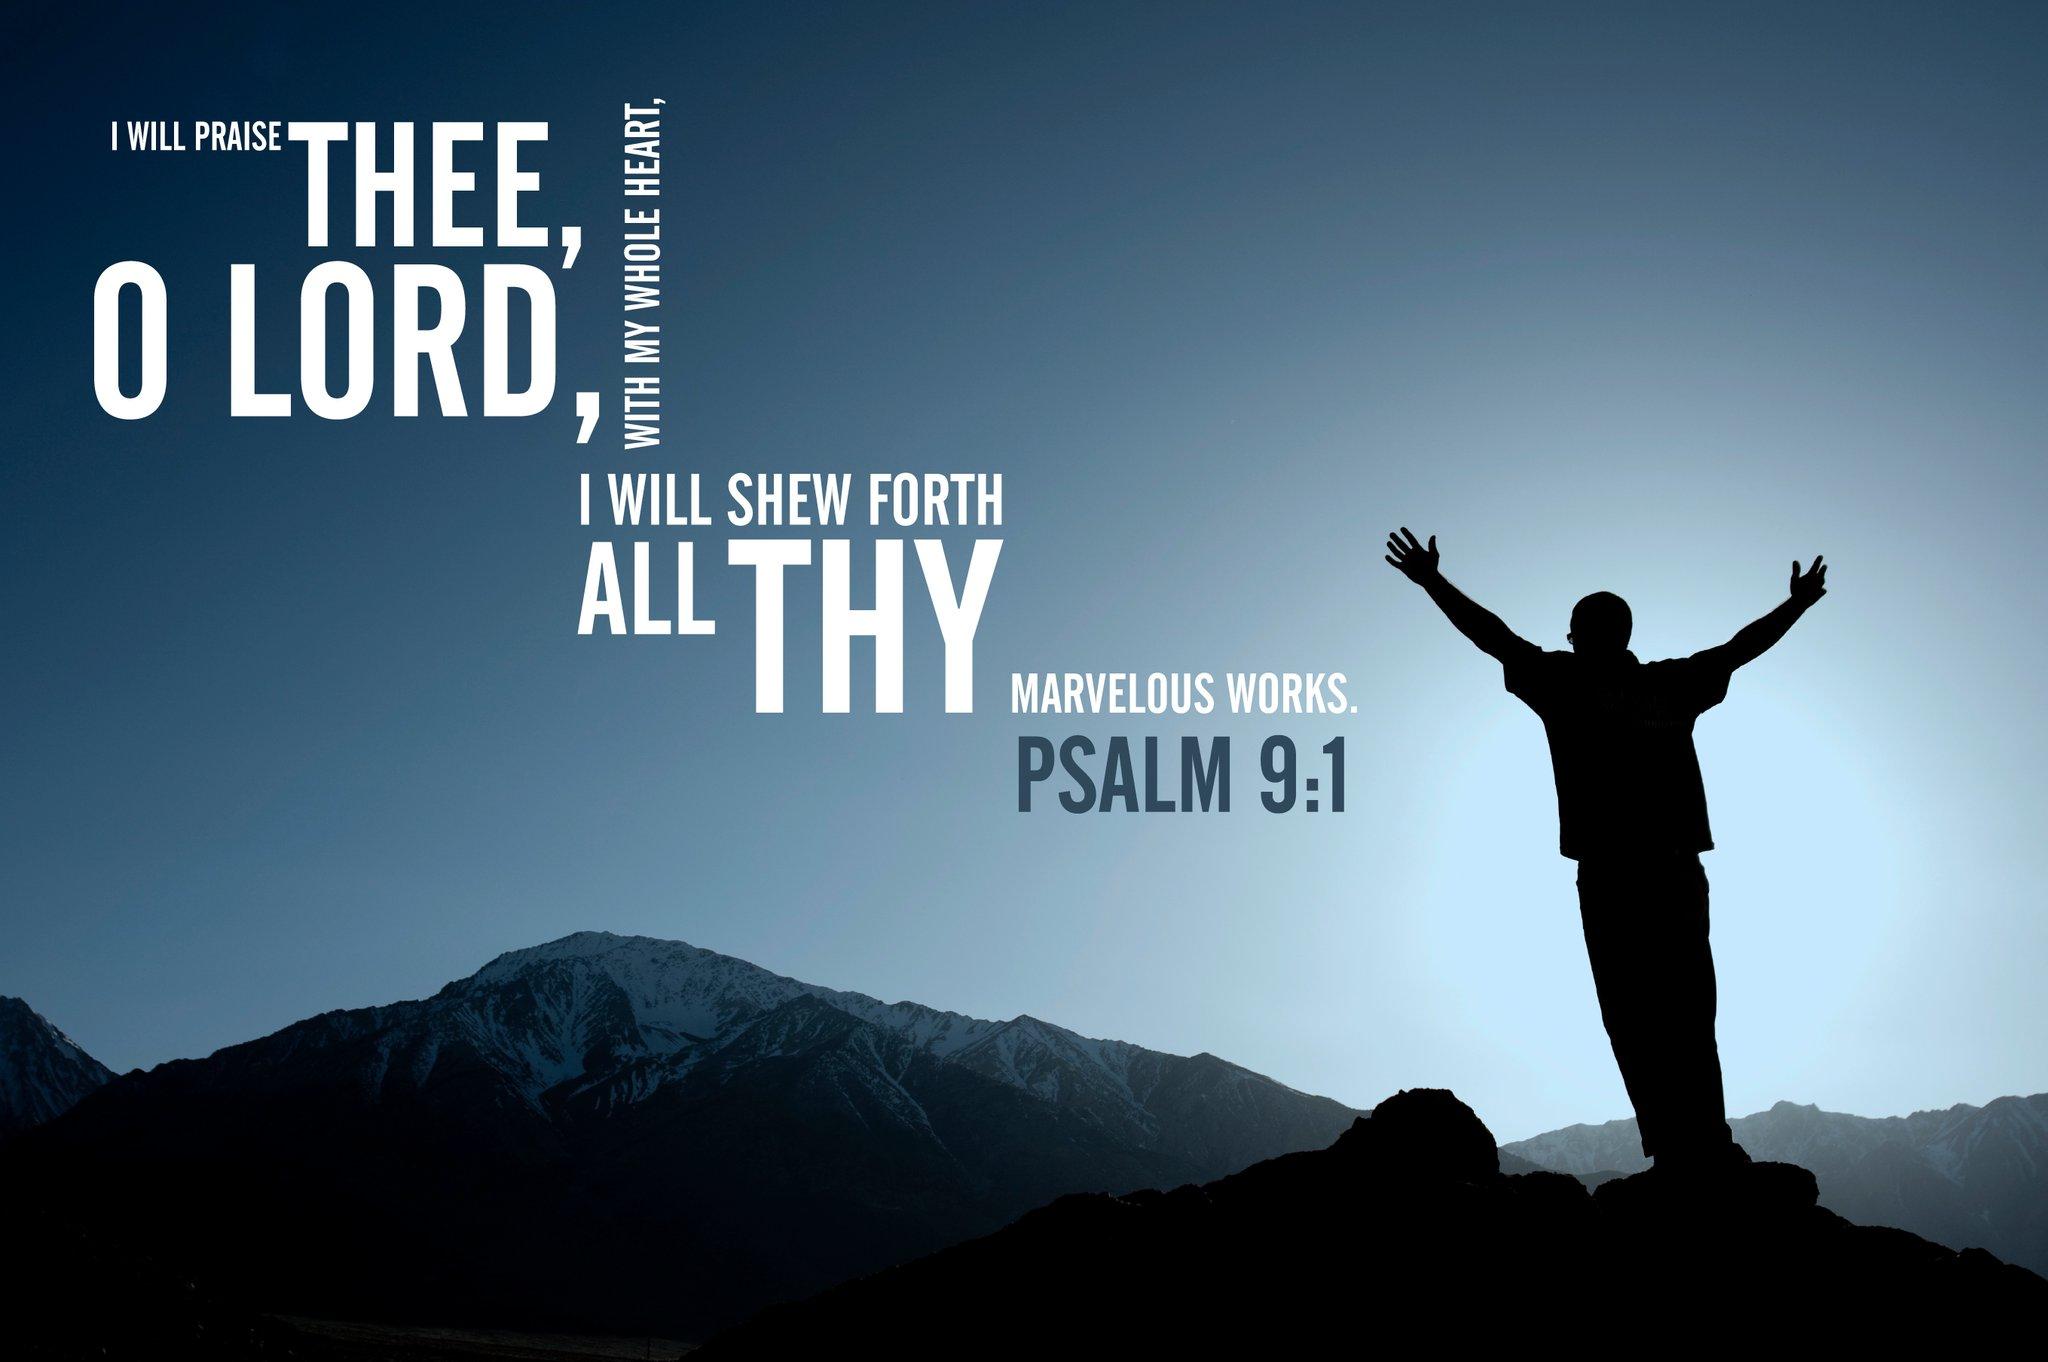 bible verses free download